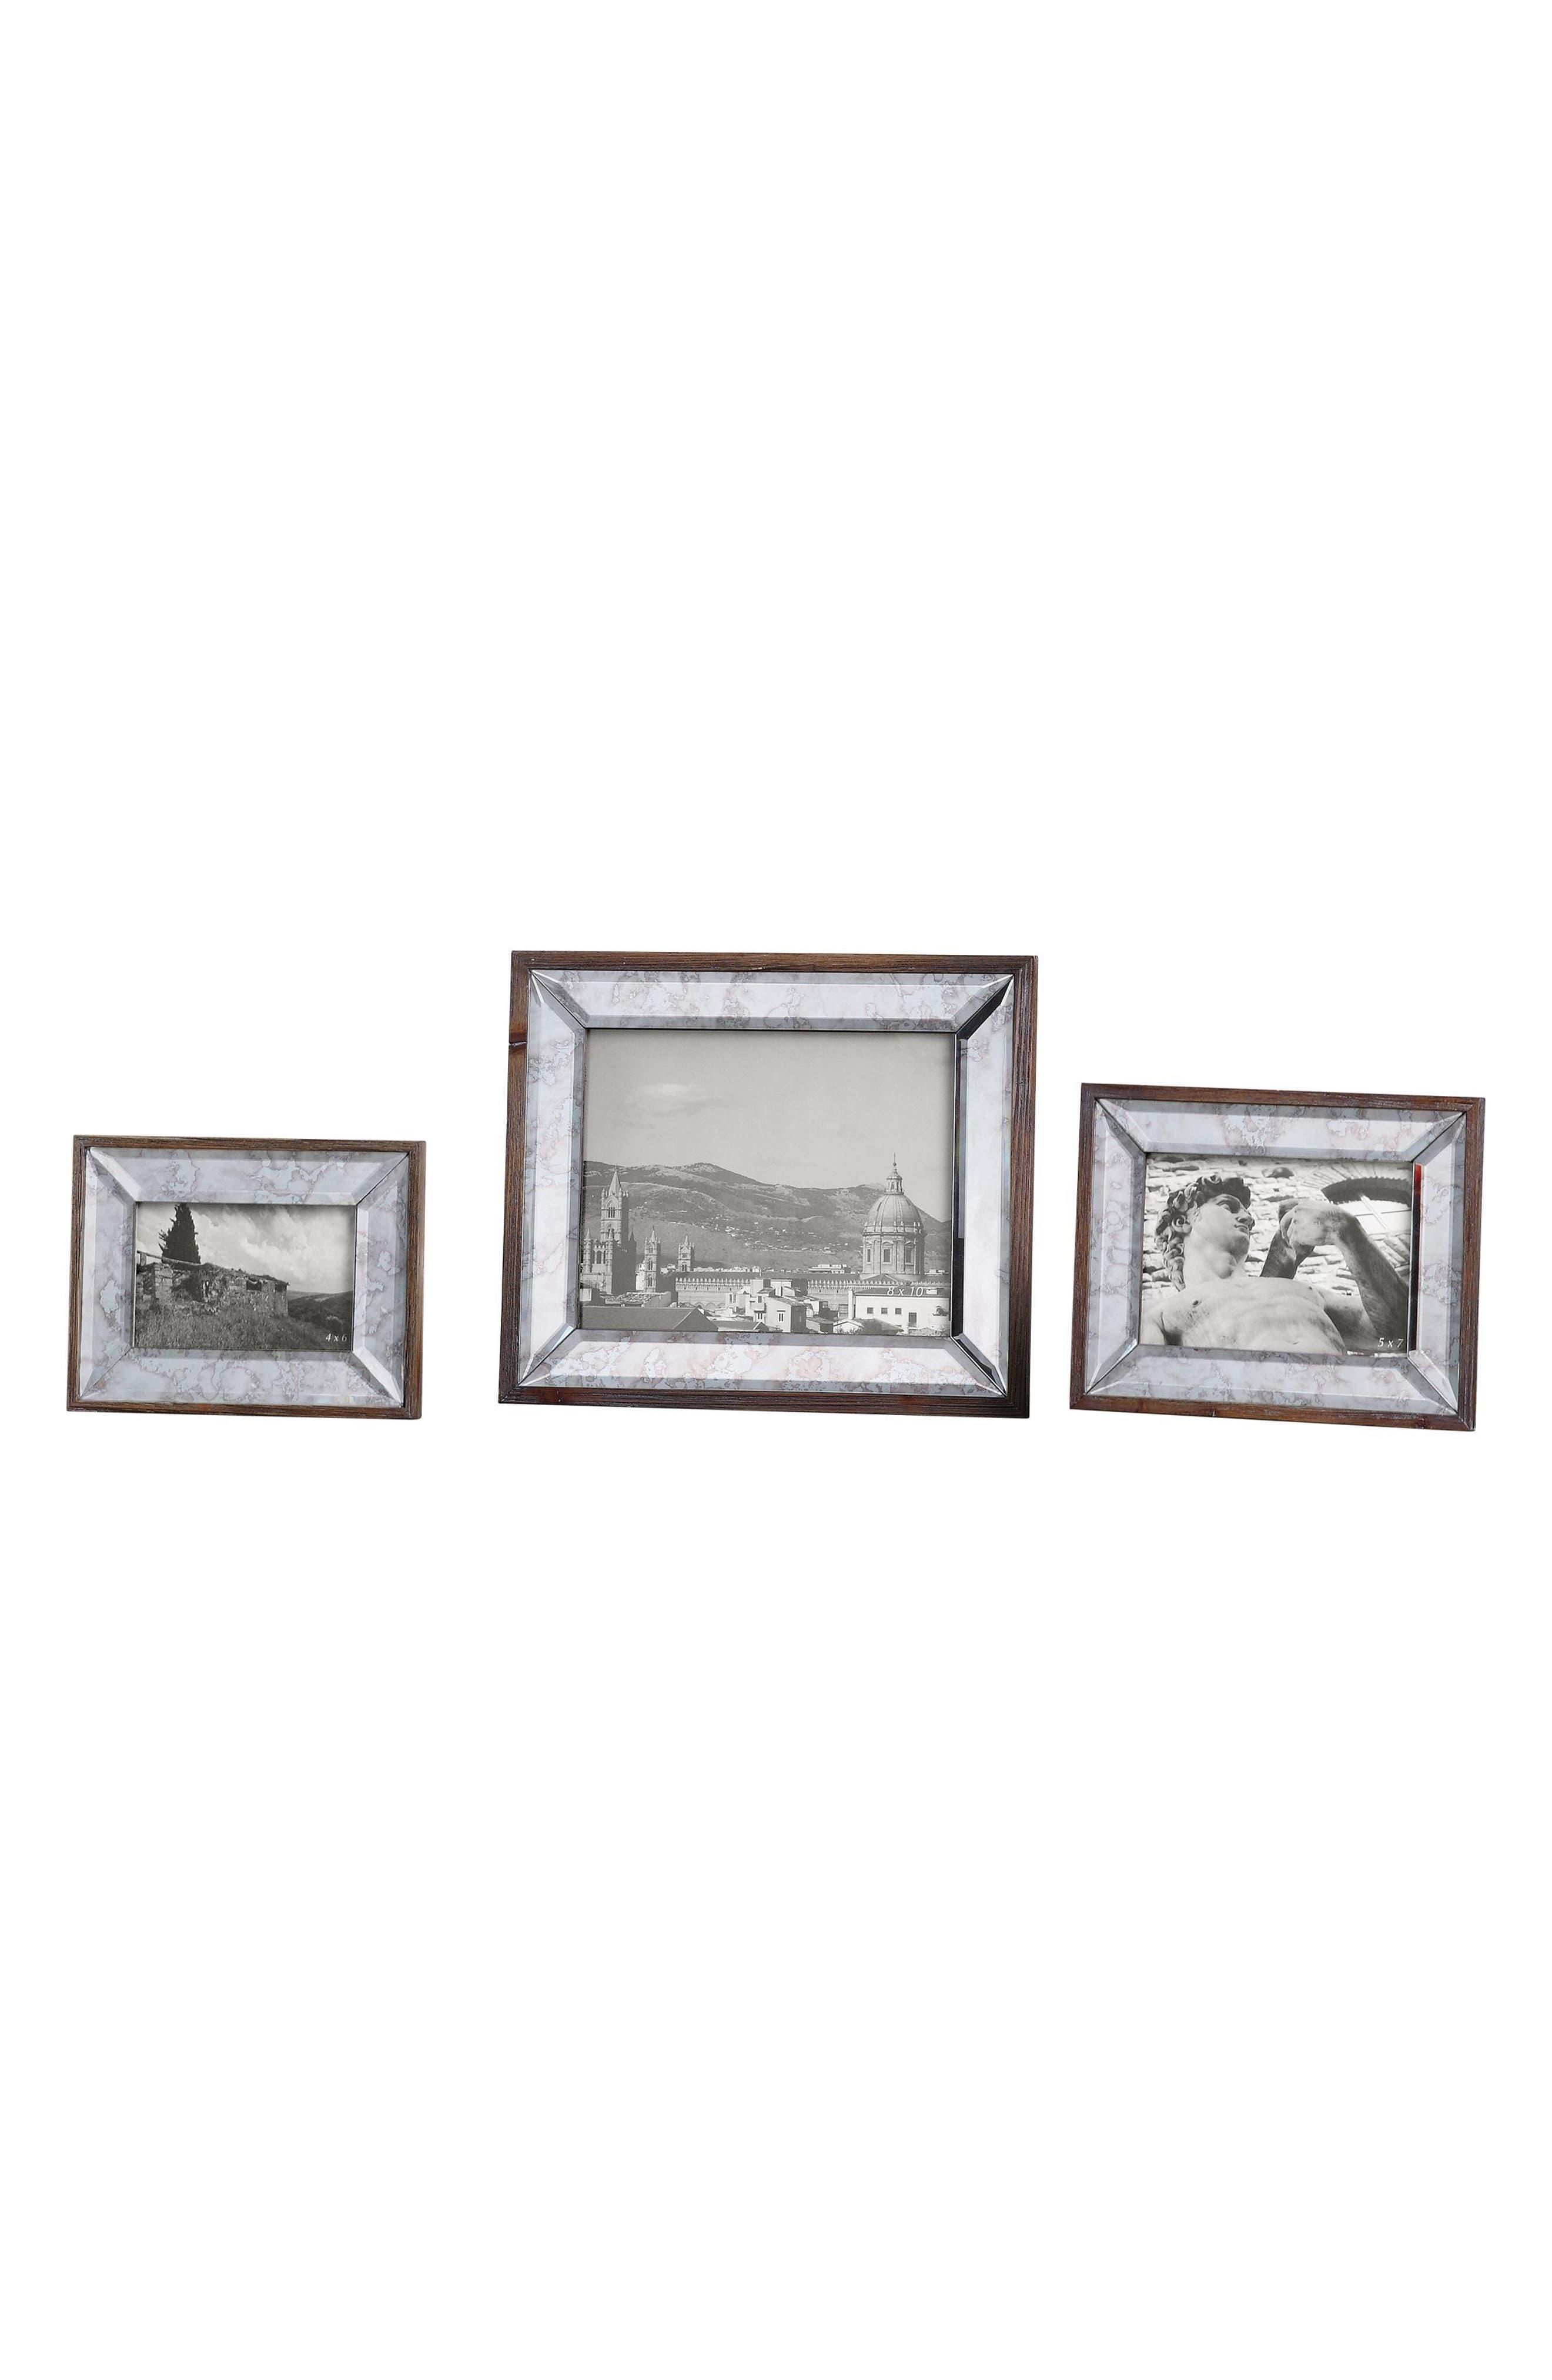 Daria Set of 3 Picture Frames,                             Main thumbnail 1, color,                             040